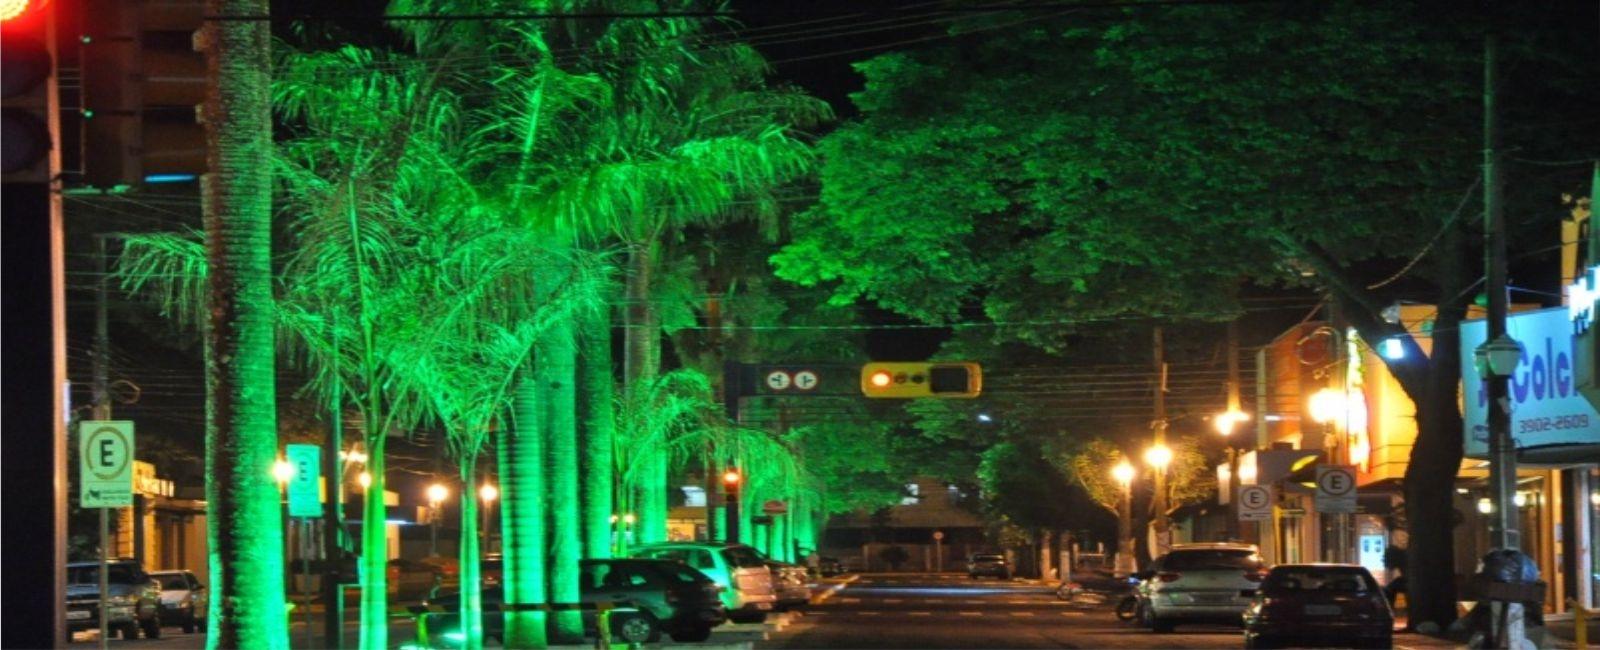 FOTO DOURADOS 2